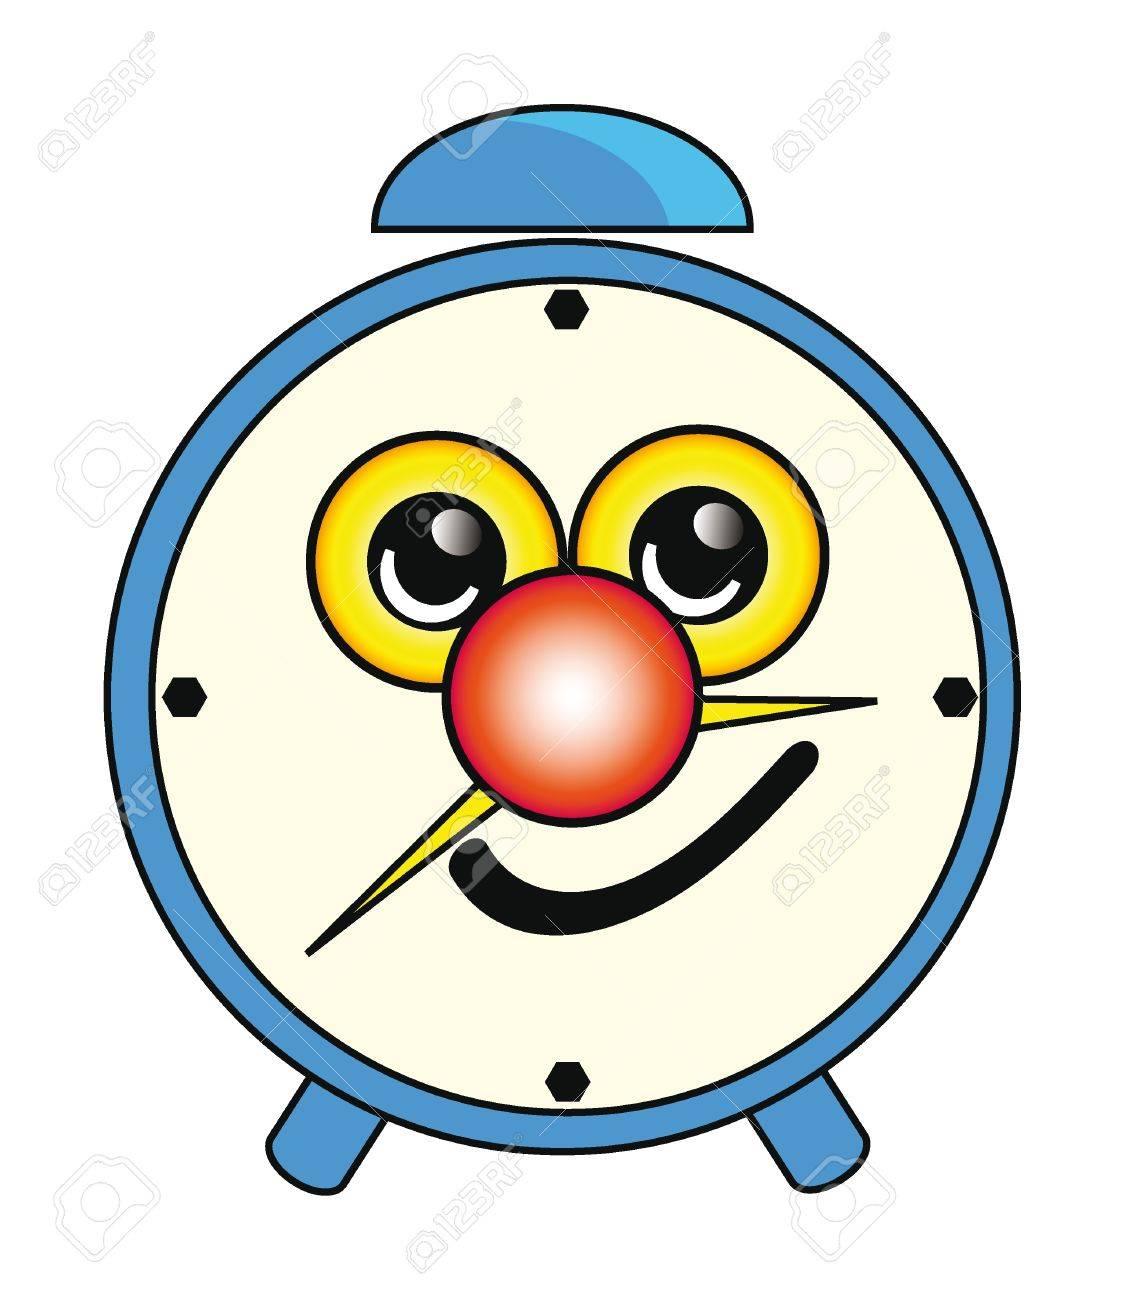 Illustration of happy cartoon alarm clock isolation over white background Stock Vector - 8904210